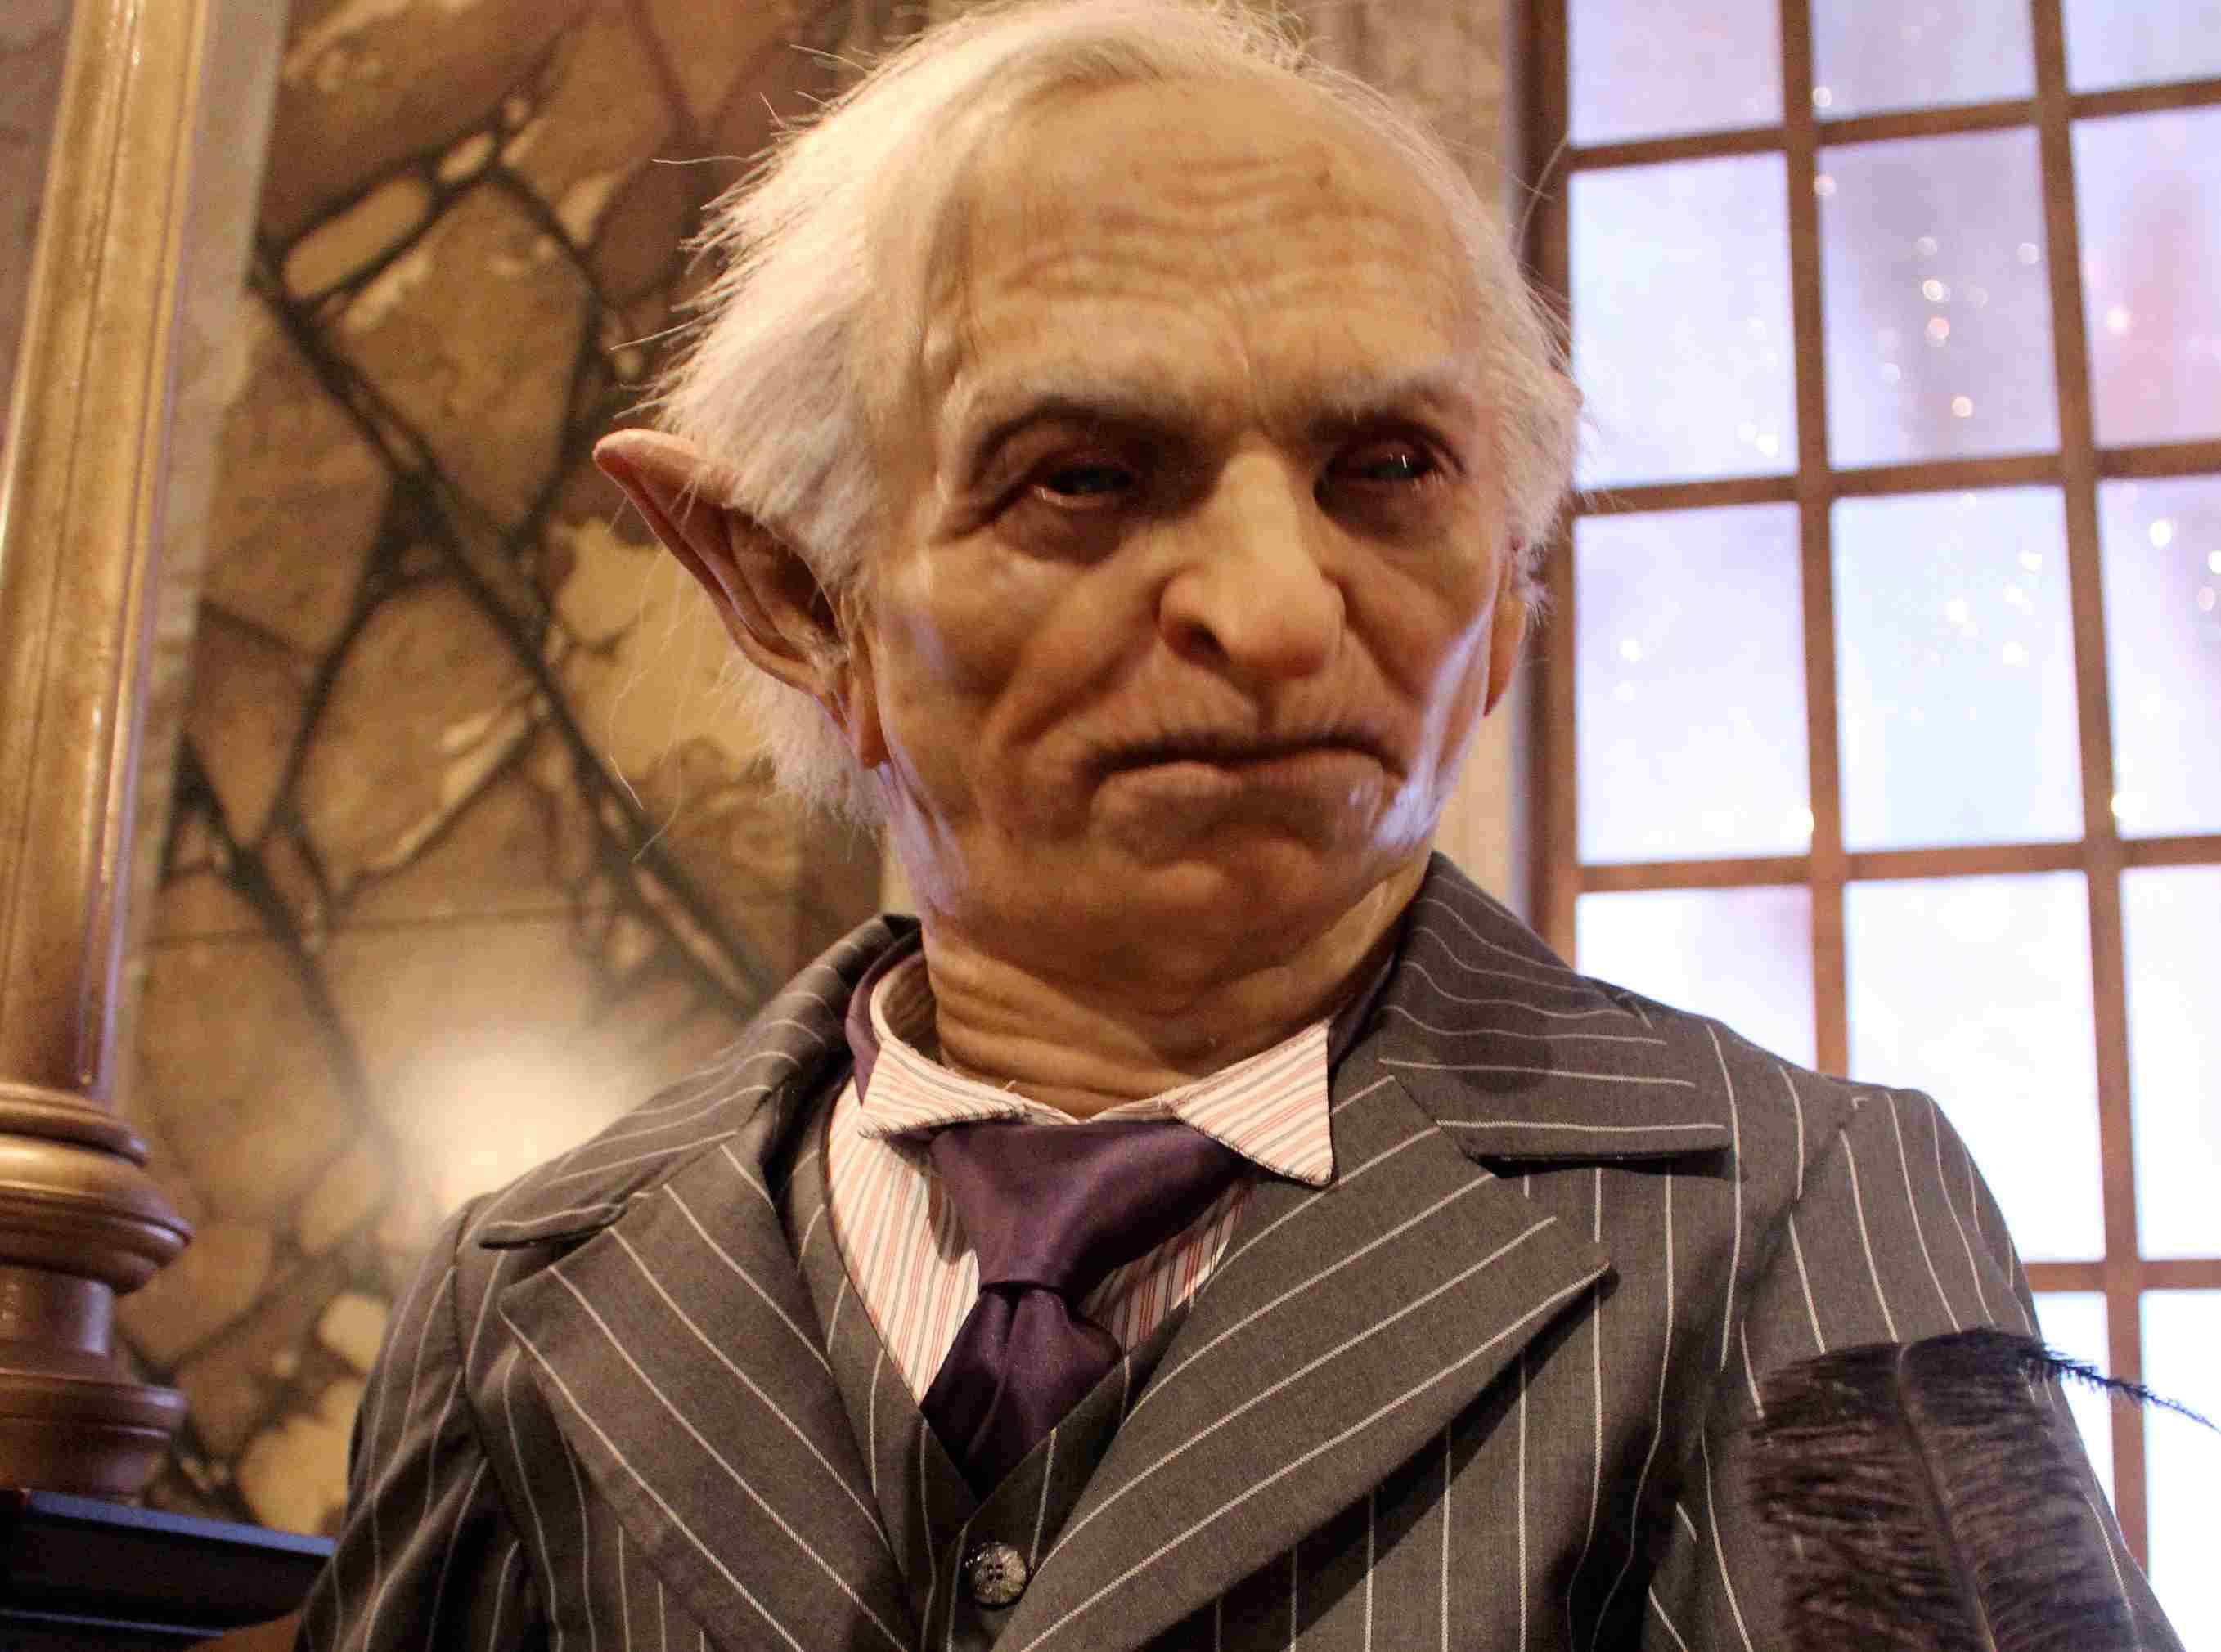 Gringotts Goblin at Universal Orlando